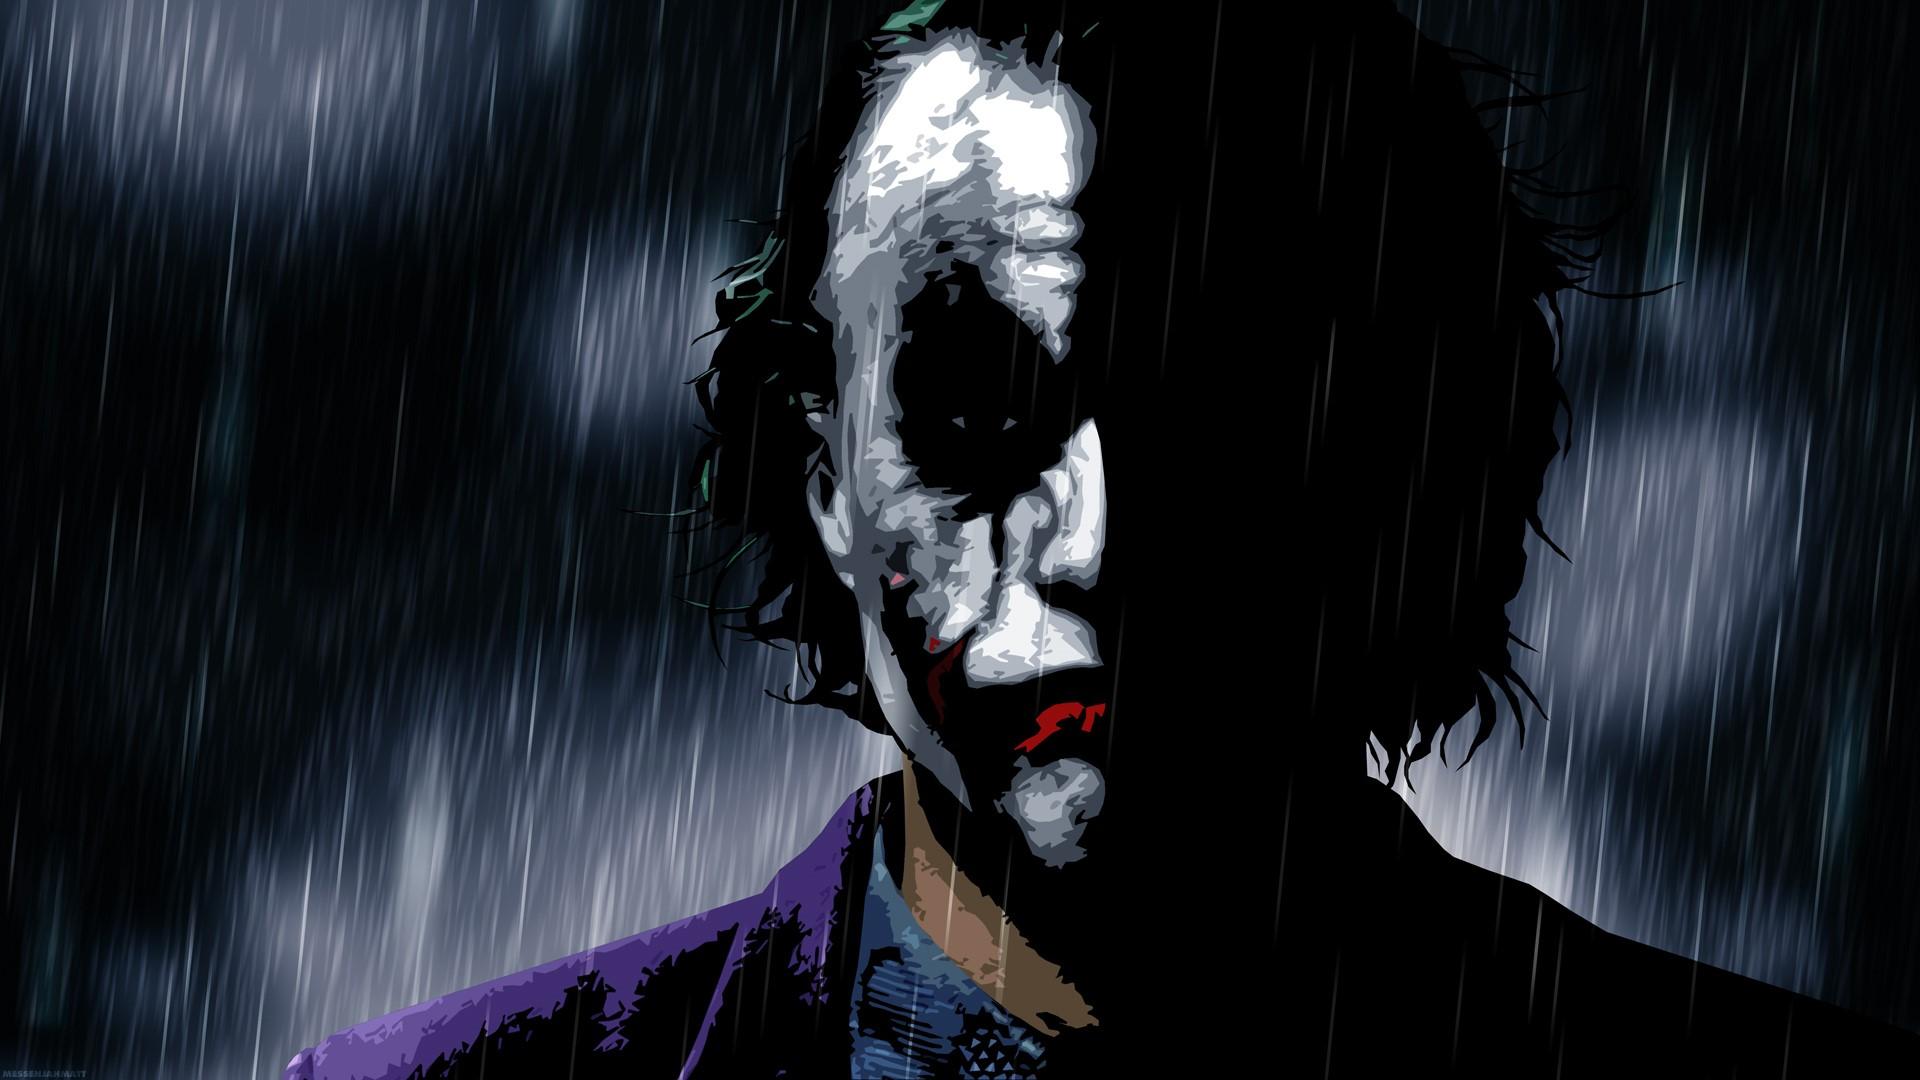 Joker 1080p wallpaper